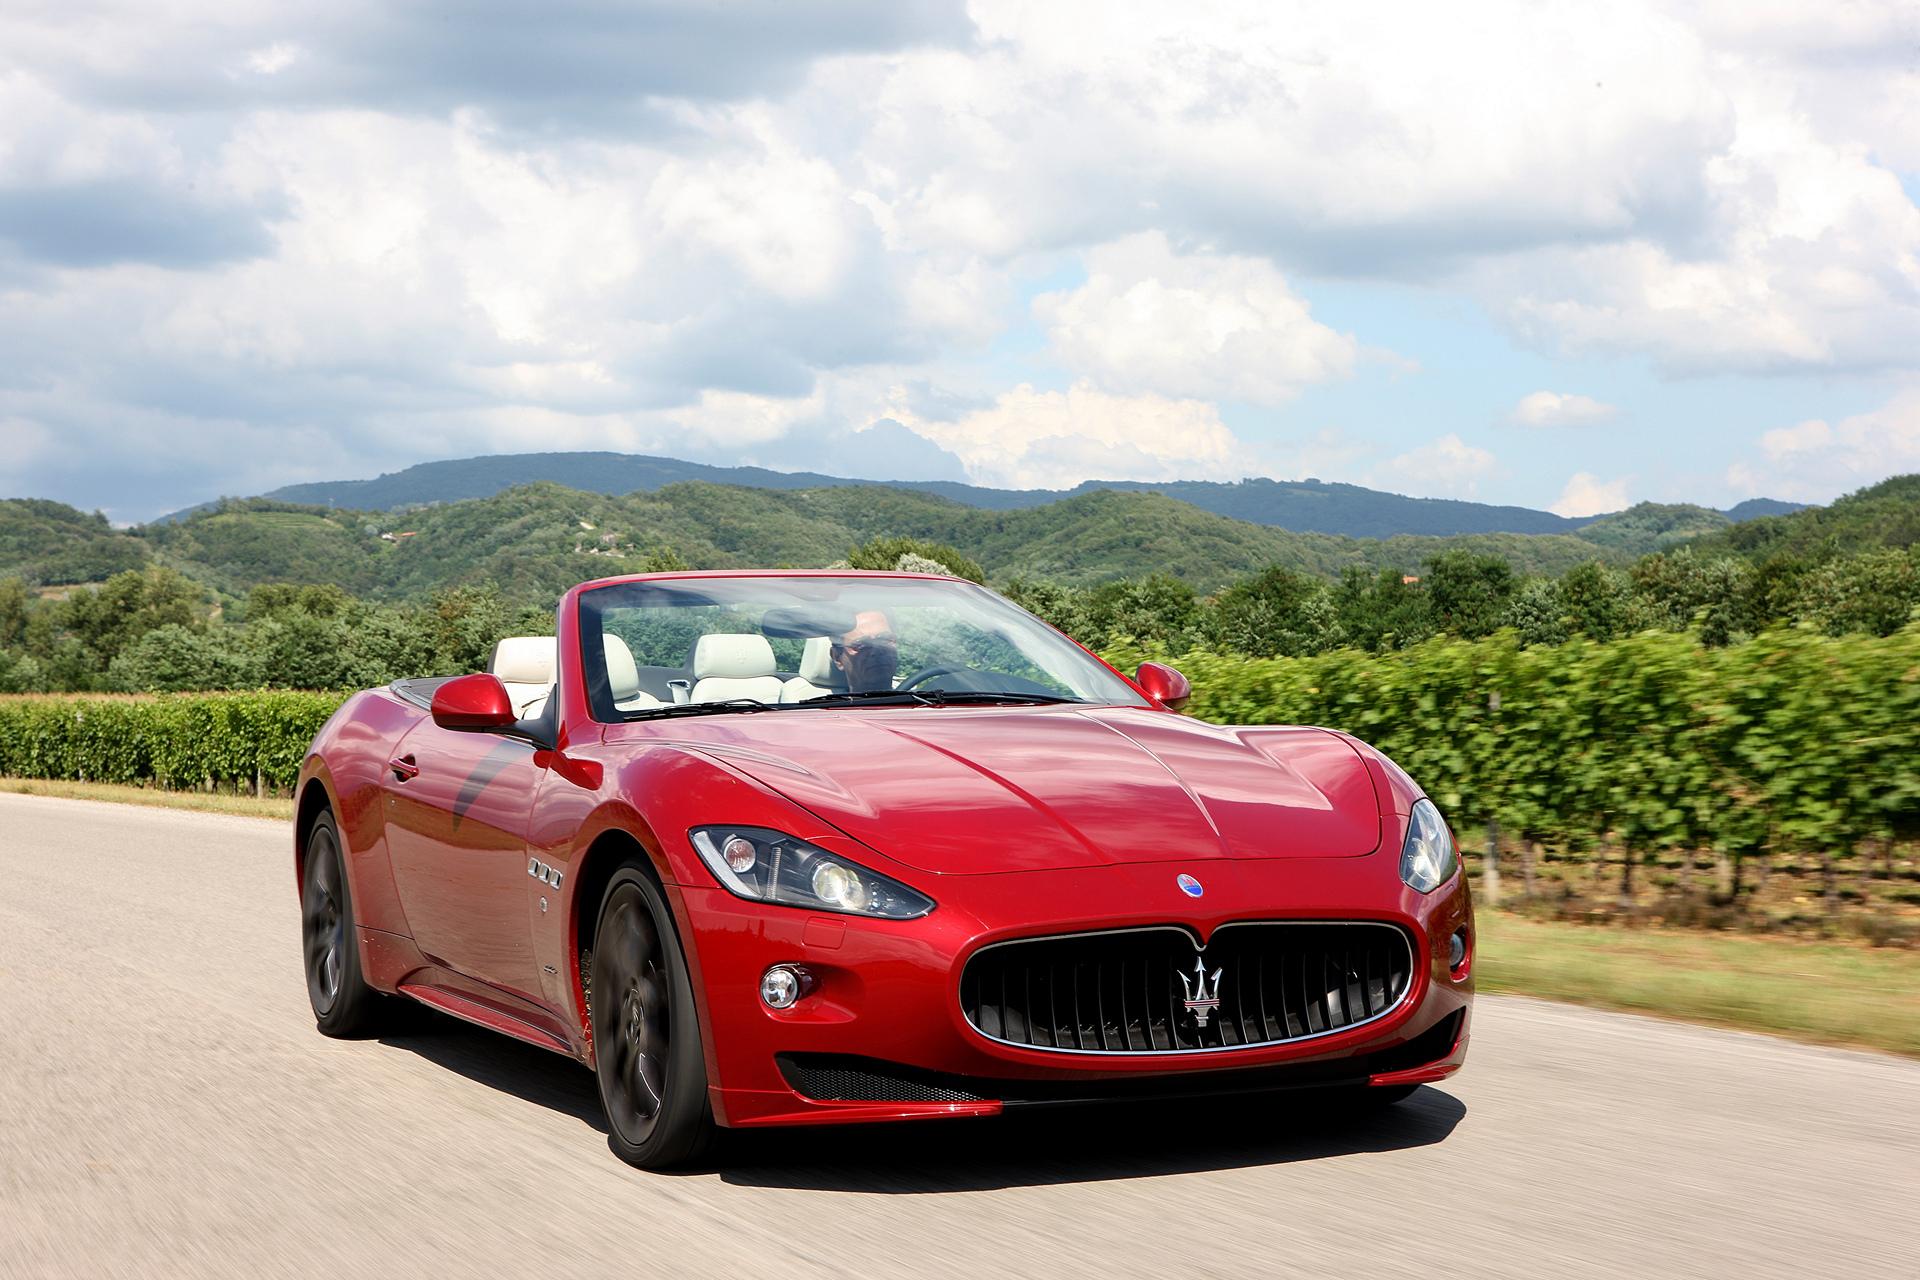 Maserati GranTurismo Convertible © Fiat Chrysler Automobiles N.V.